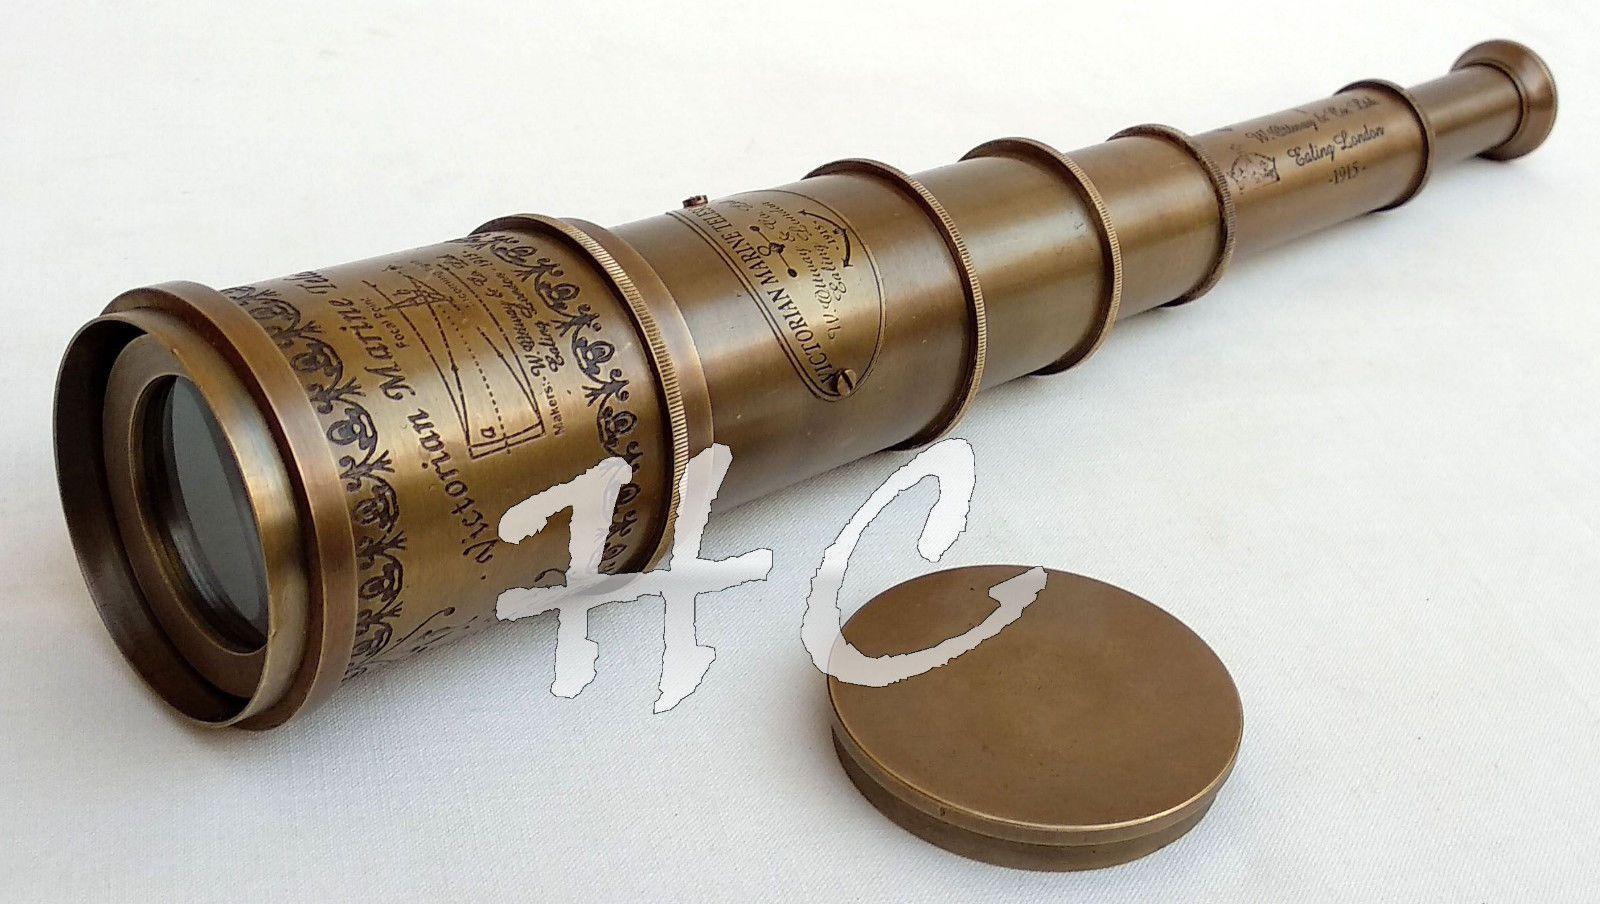 BRASS LEATHER BINOCULAR ROUND POCKET TELESCOPE MARITIME ANTIQUE REPRODUC